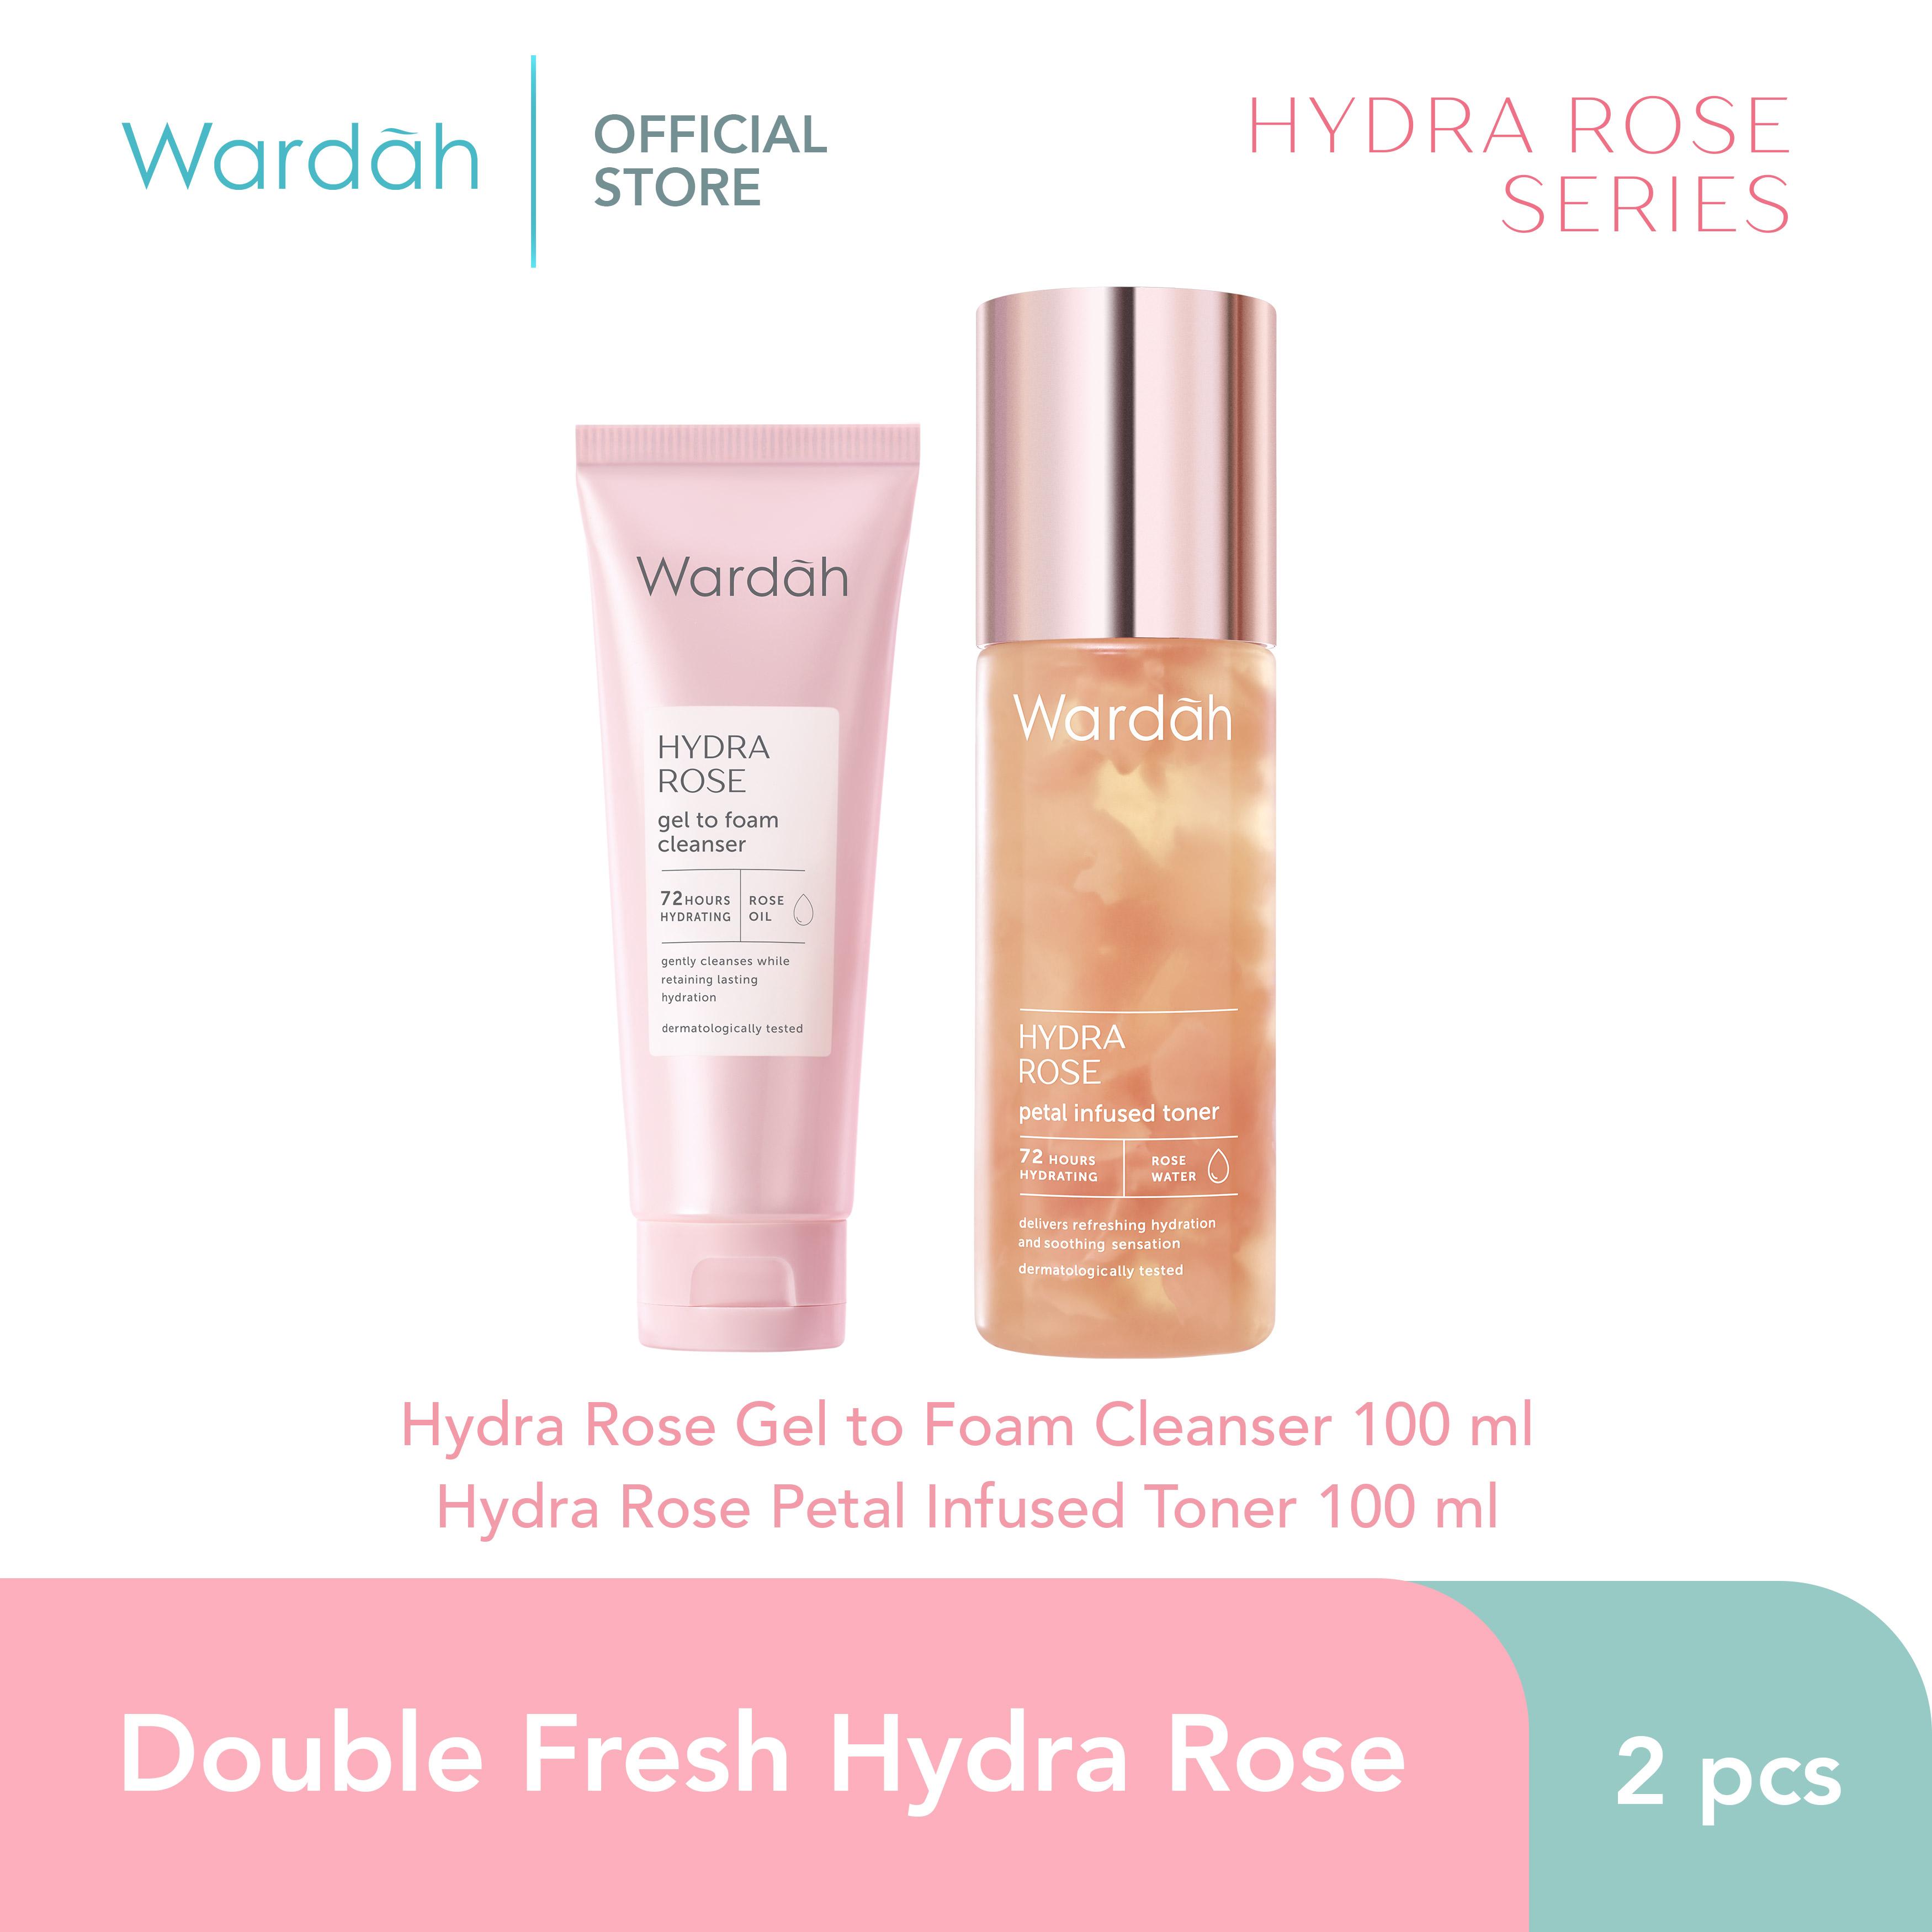 Double Fresh Hydra Rose